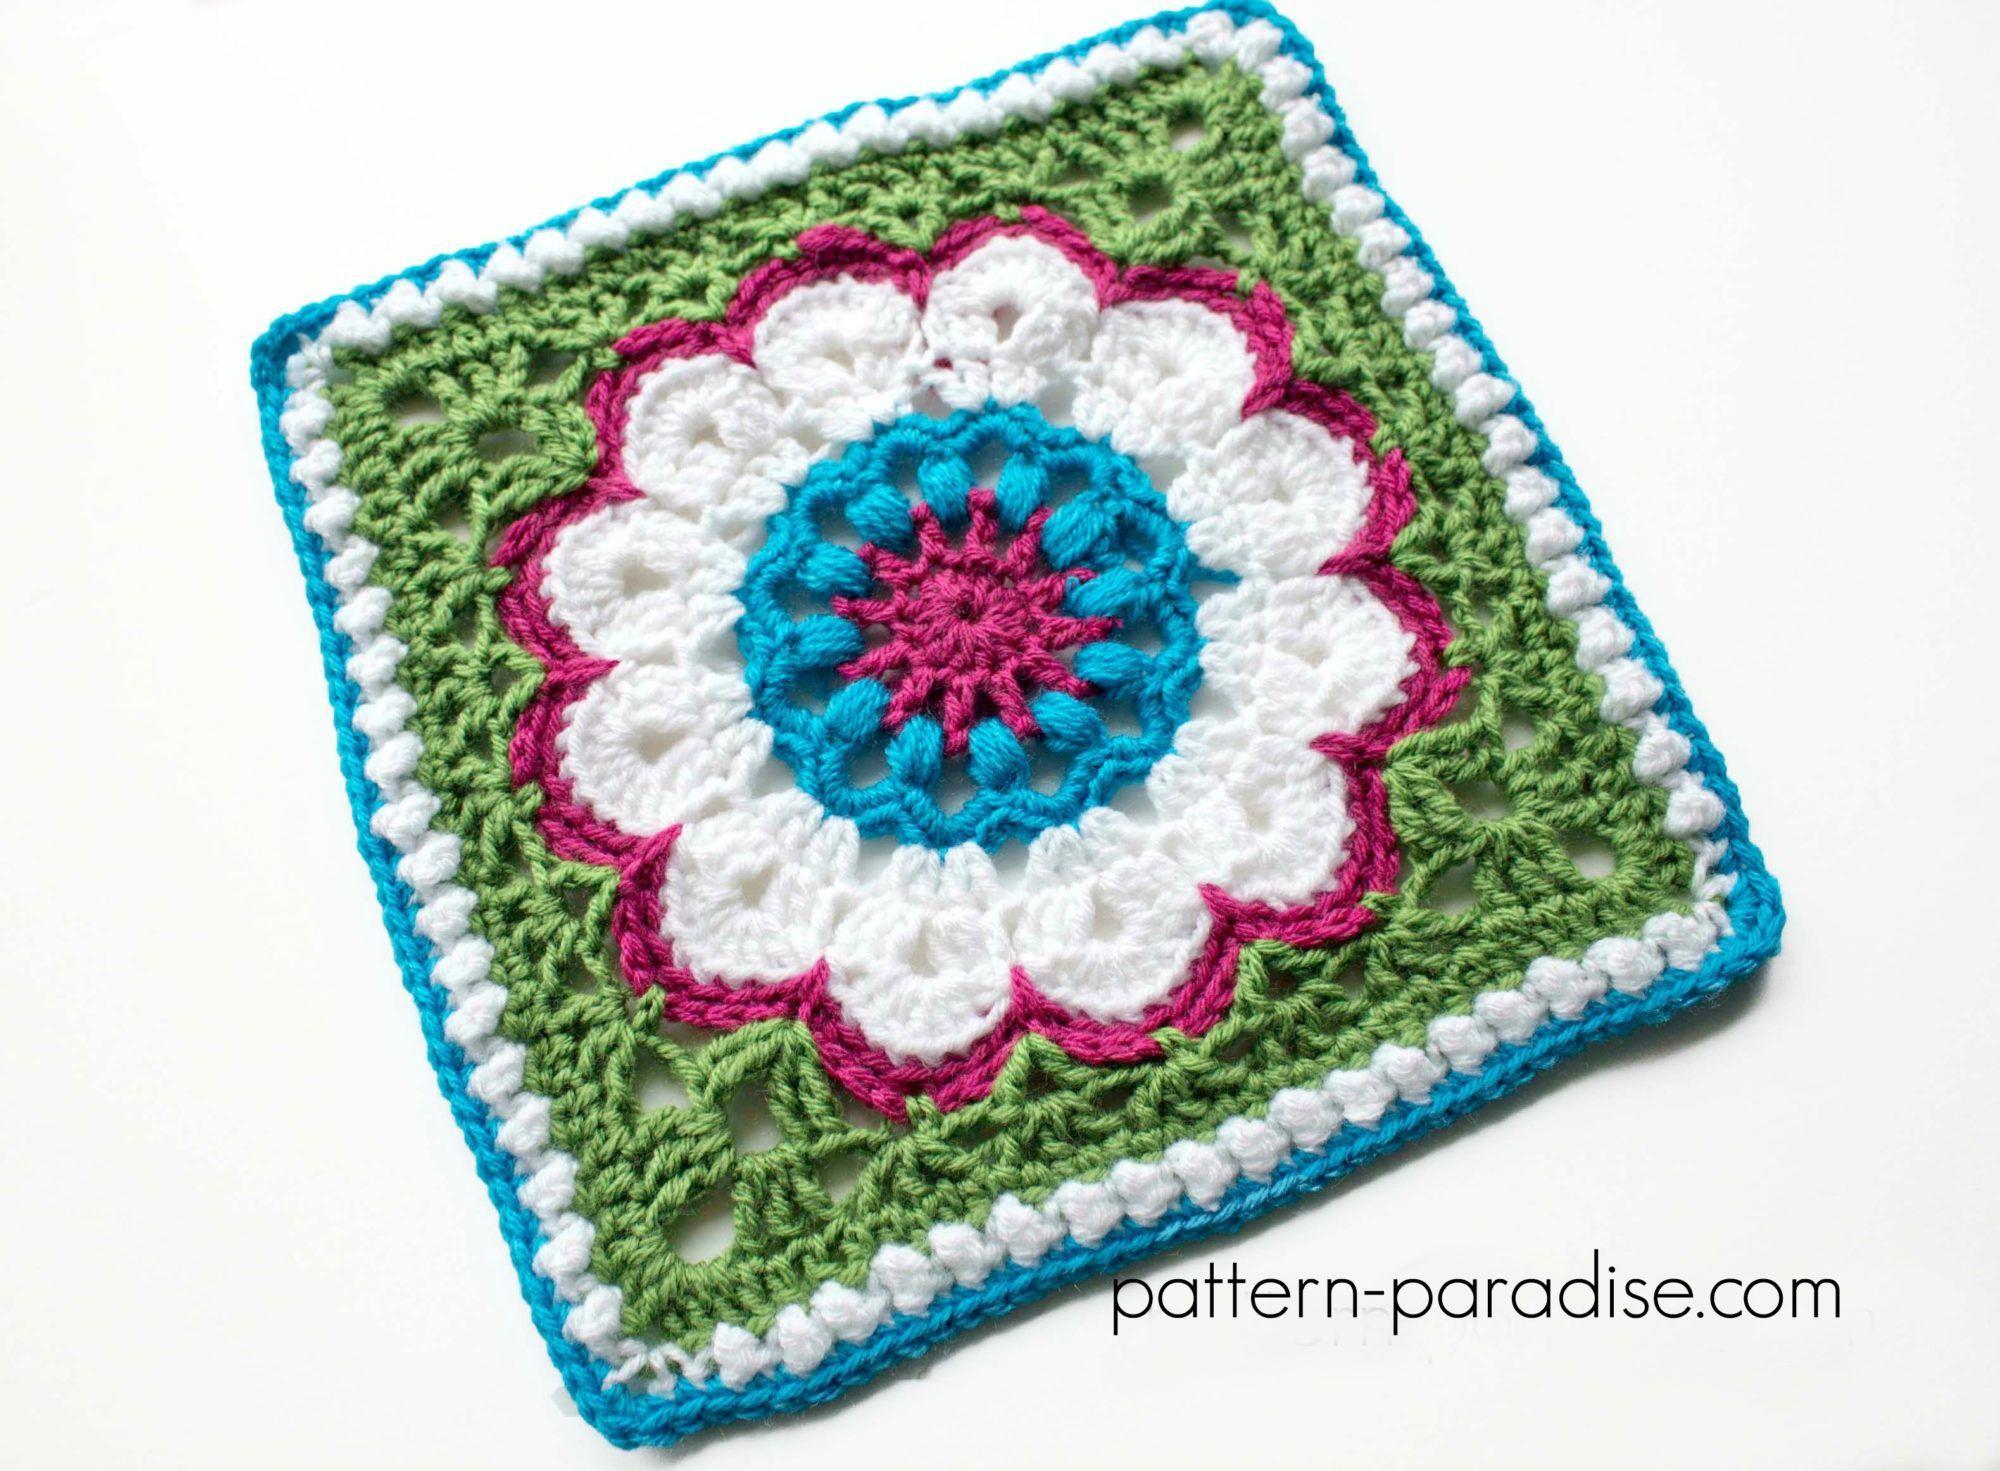 Free Crochet Pattern: Dahlia Afghan Square | Pattern Paradise ...